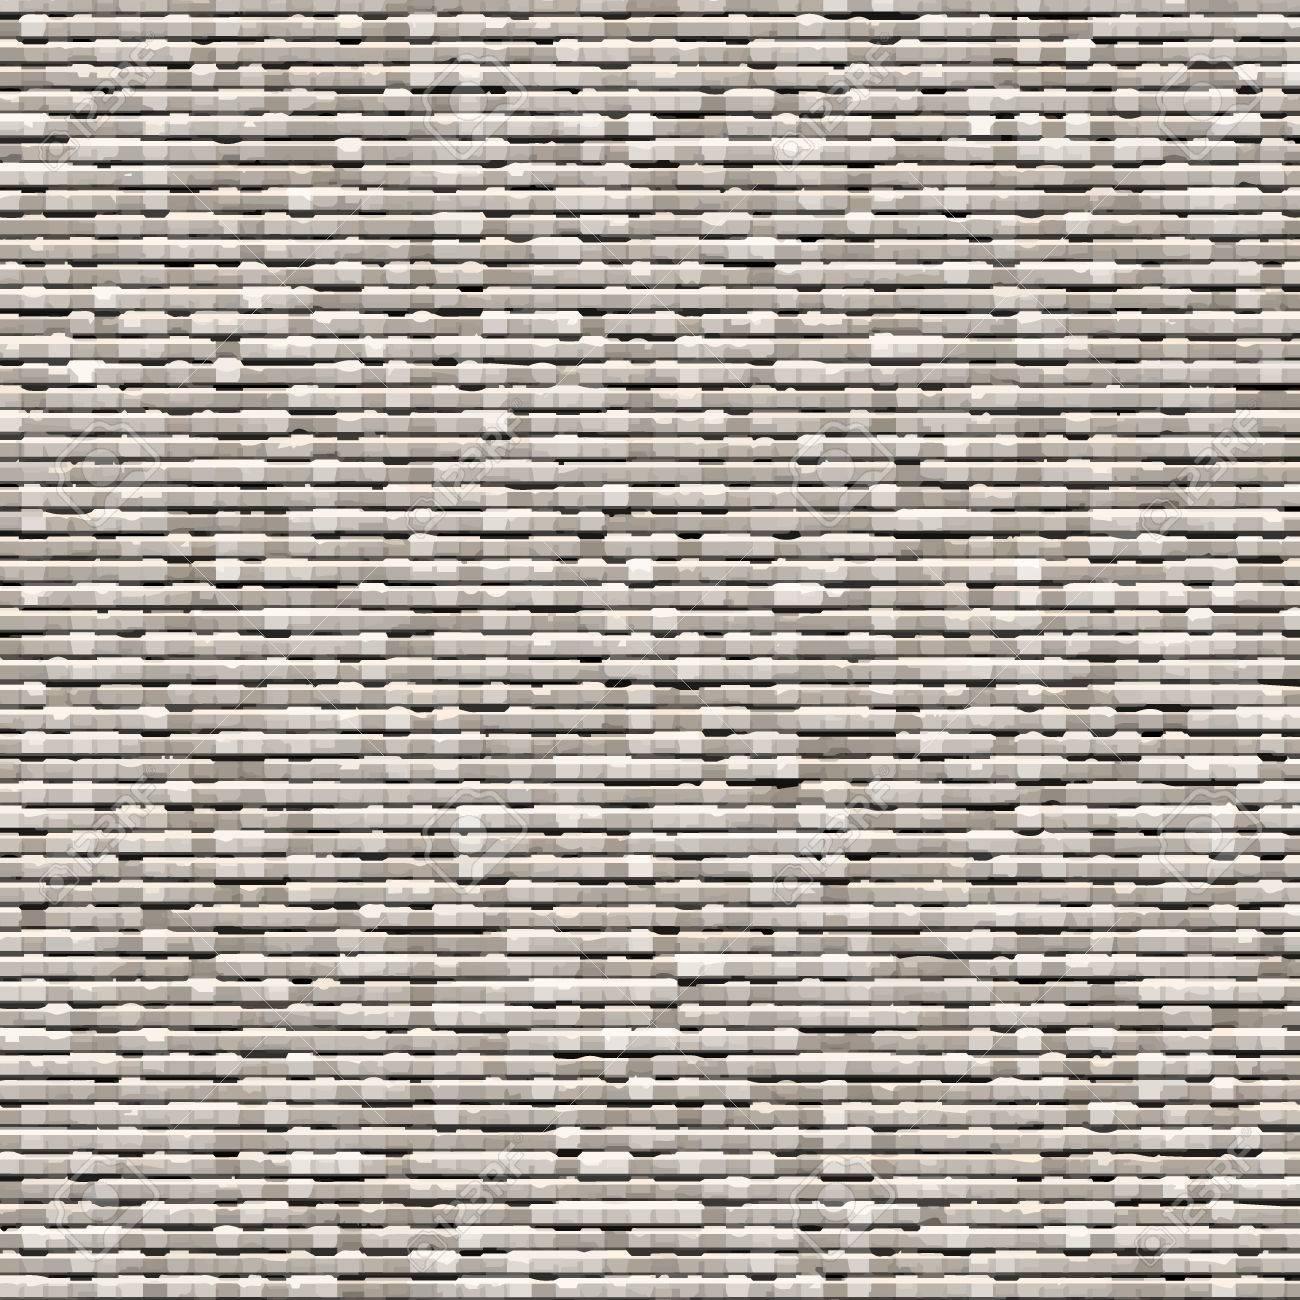 Gray background of small bricks  Grey brick wall texture  Vector